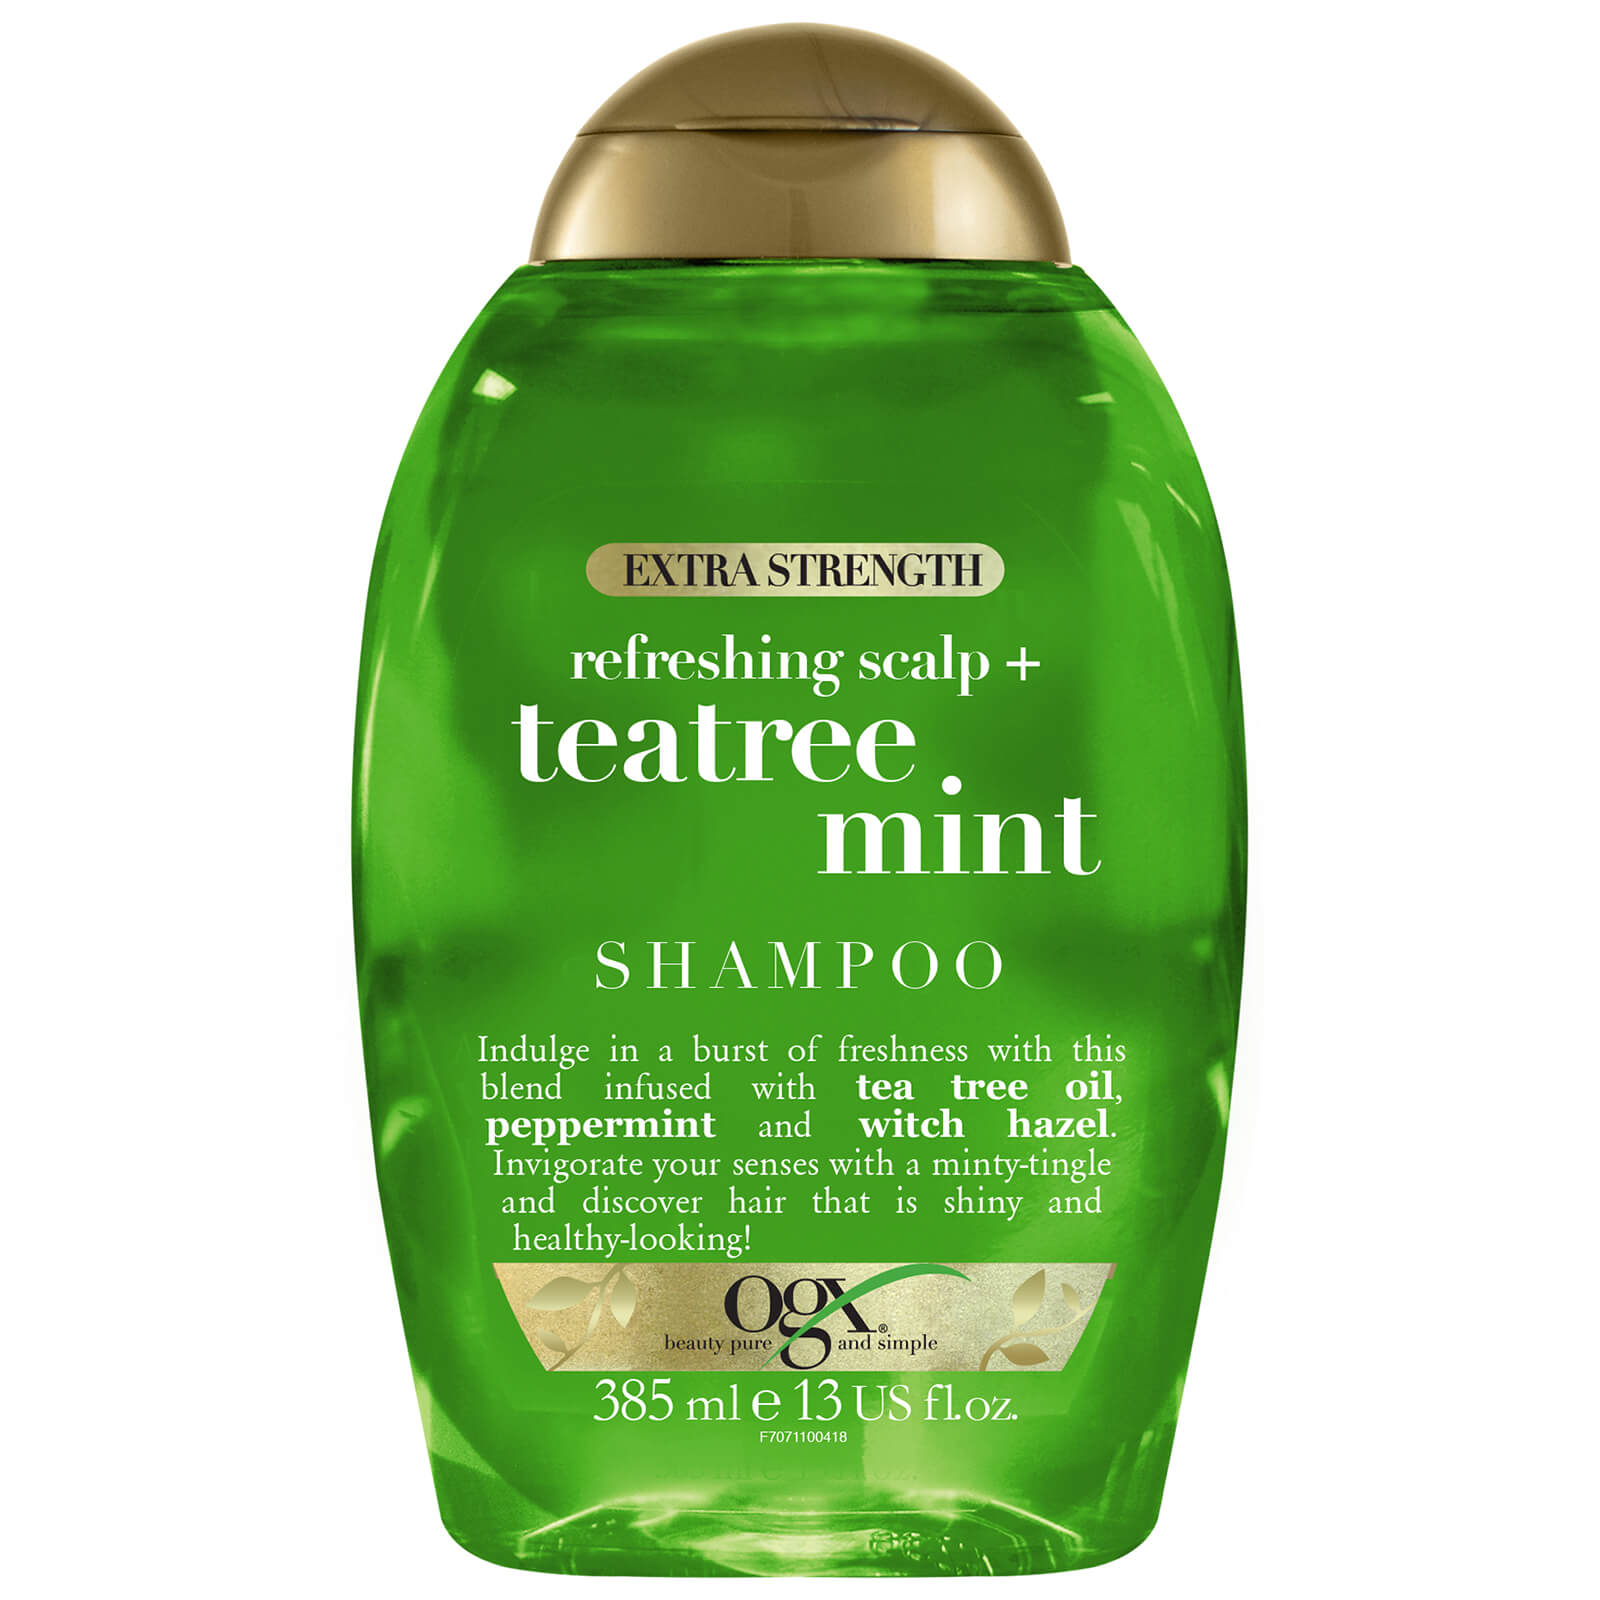 Купить OGX Refreshing Scalp+ Teatree Mint Extra Strength Shampoo 385ml